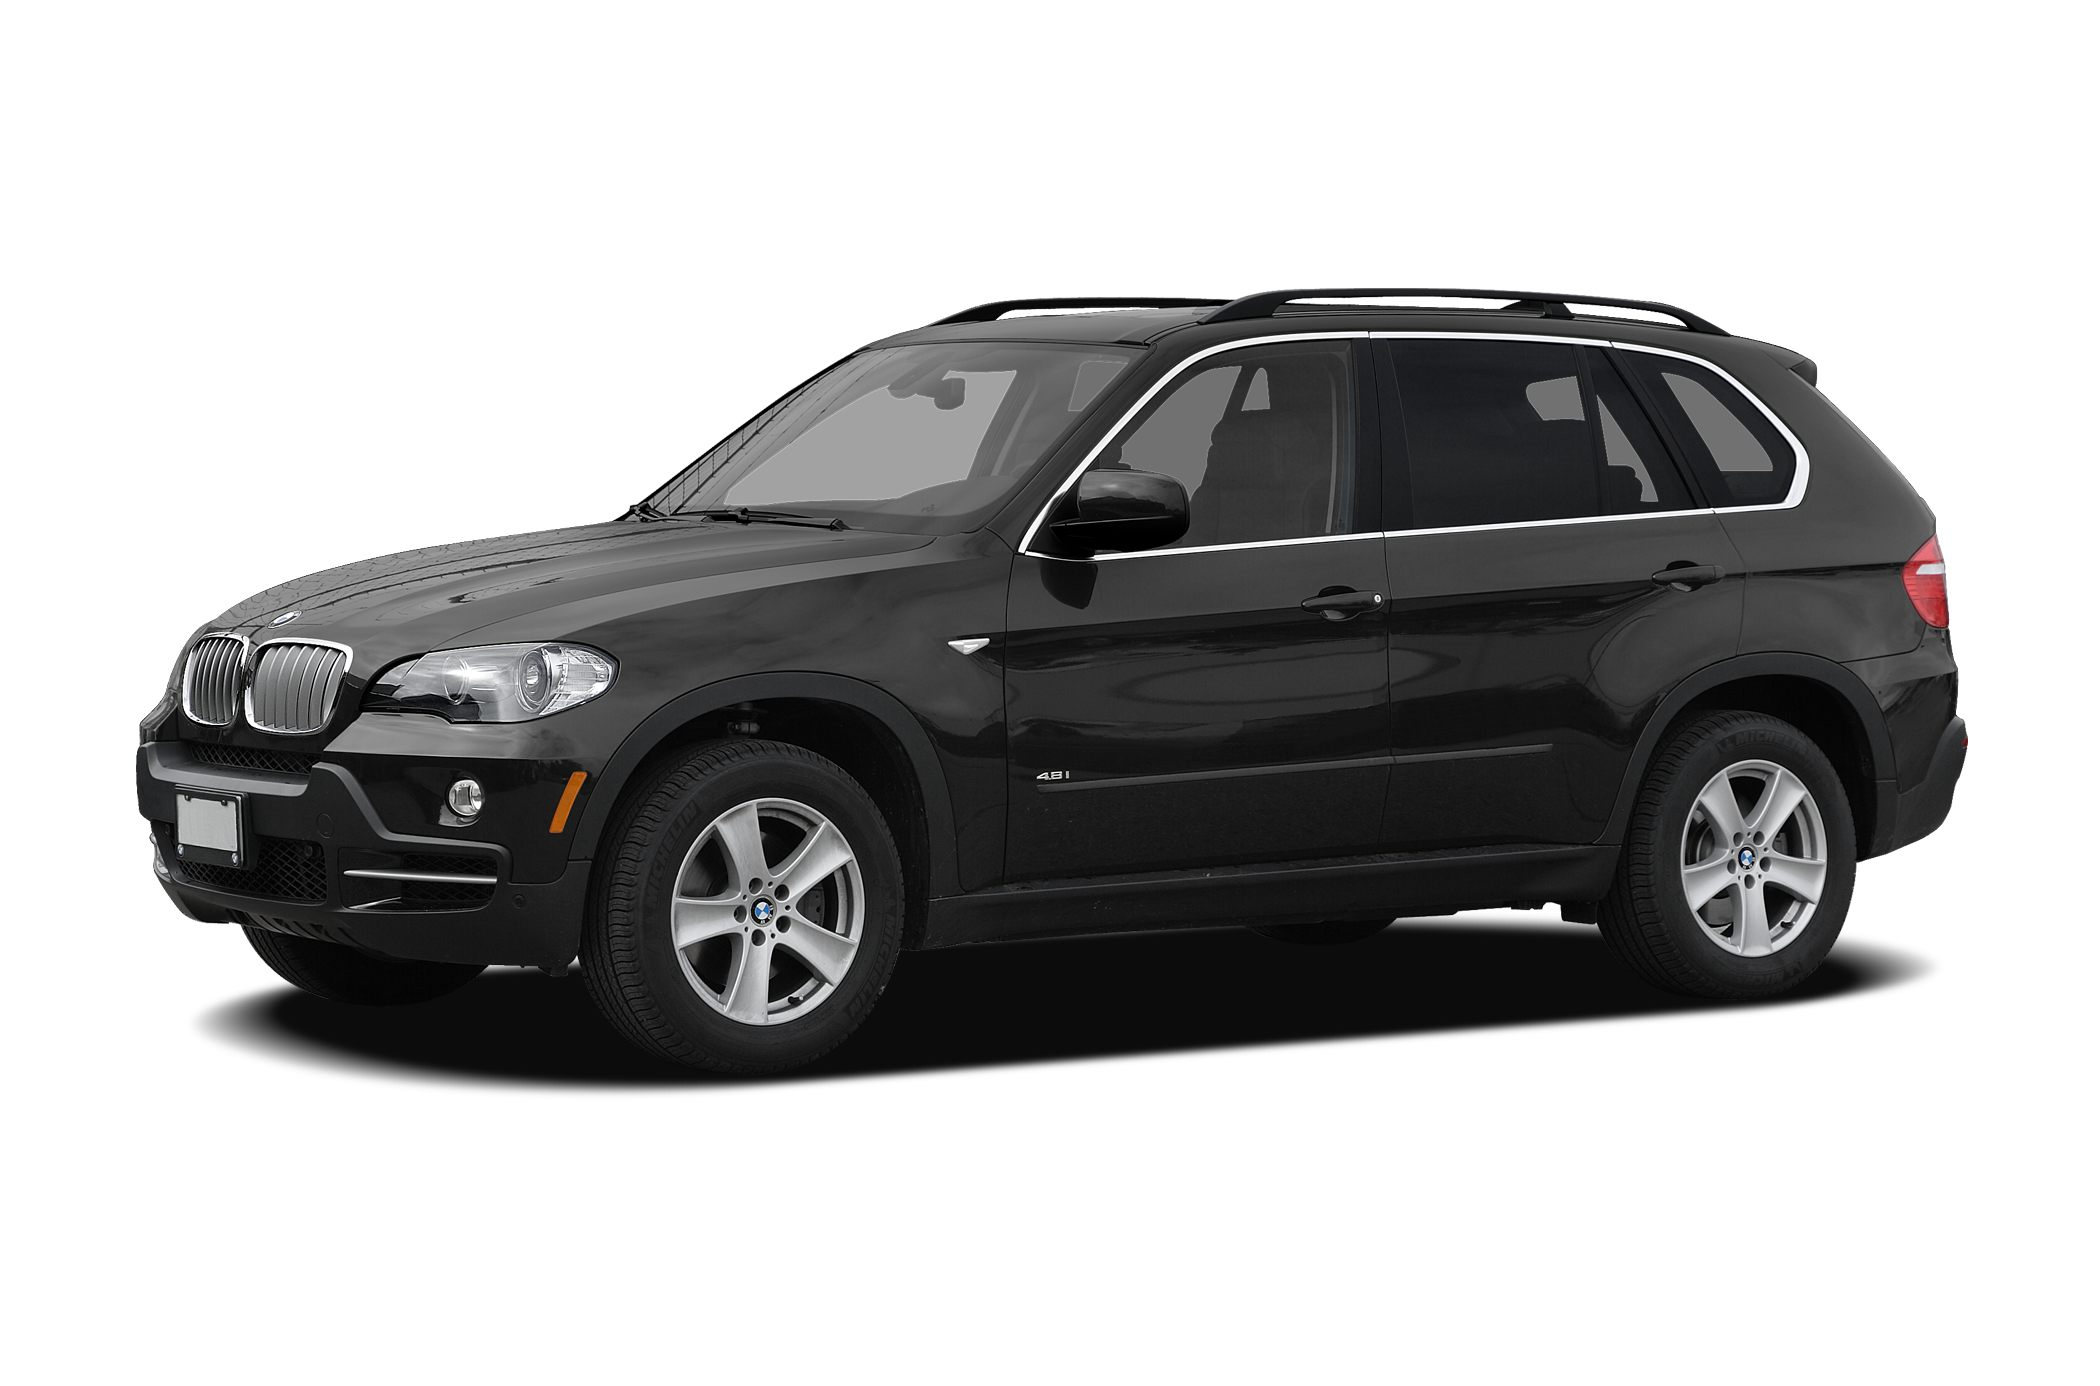 BMW X5 3.0 2000 2001 2002 2003 2004 2005 2006 2007-2015 starter motor